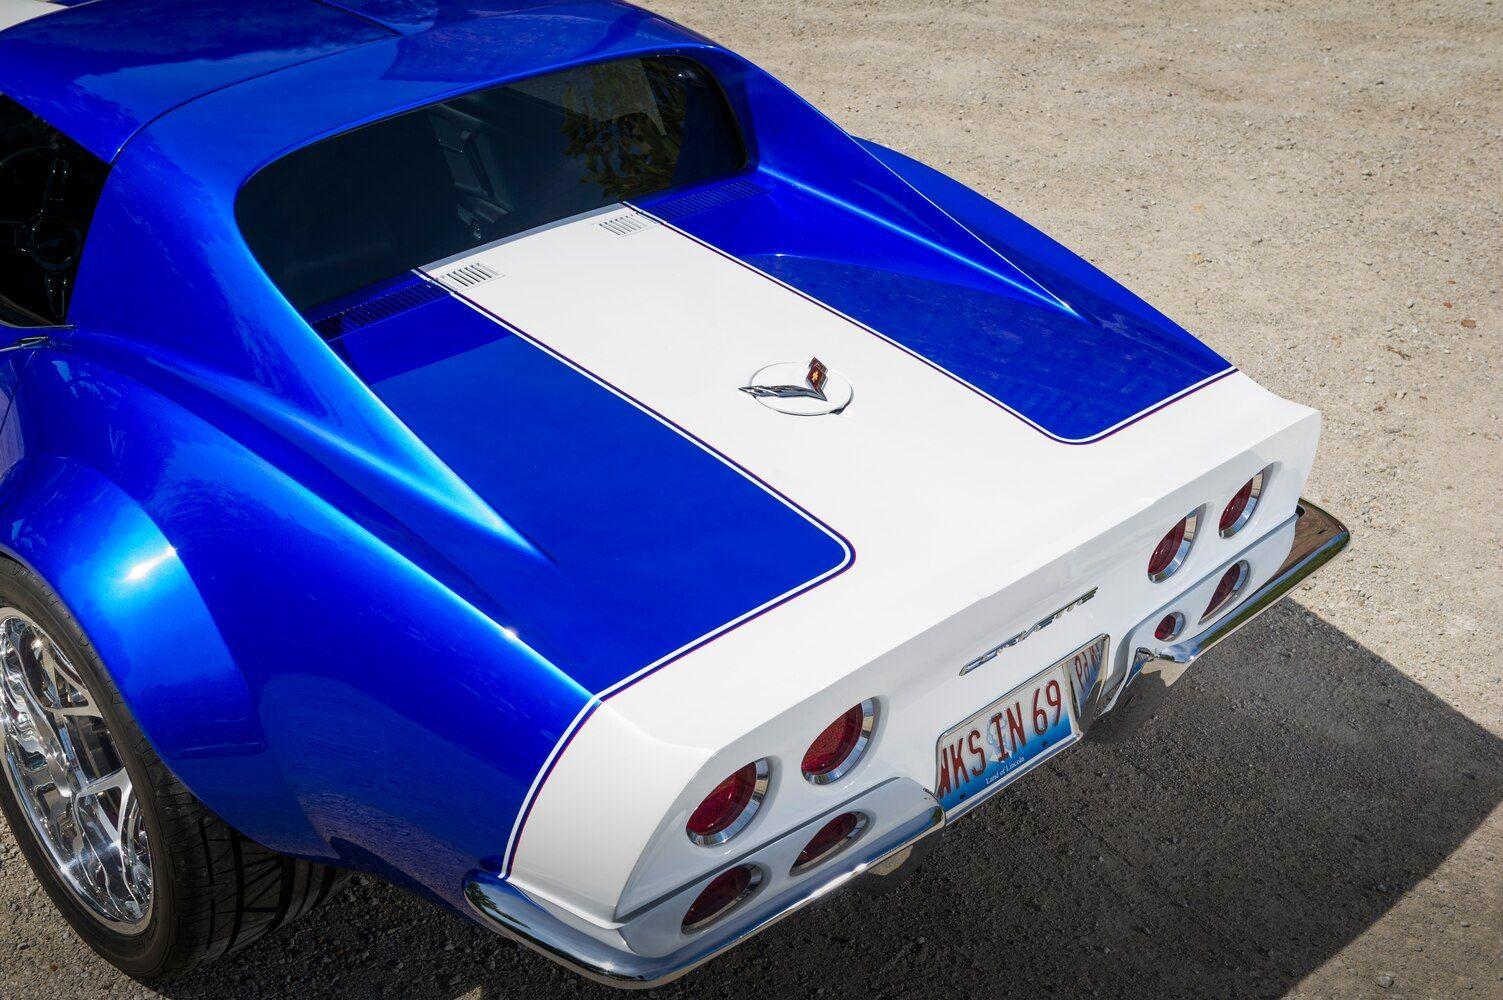 Ls Powered 1969 Chevrolet Corvette Stingray Comes Full Circle In 2020 Chevrolet Corvette Stingray Corvette Corvette Stingray